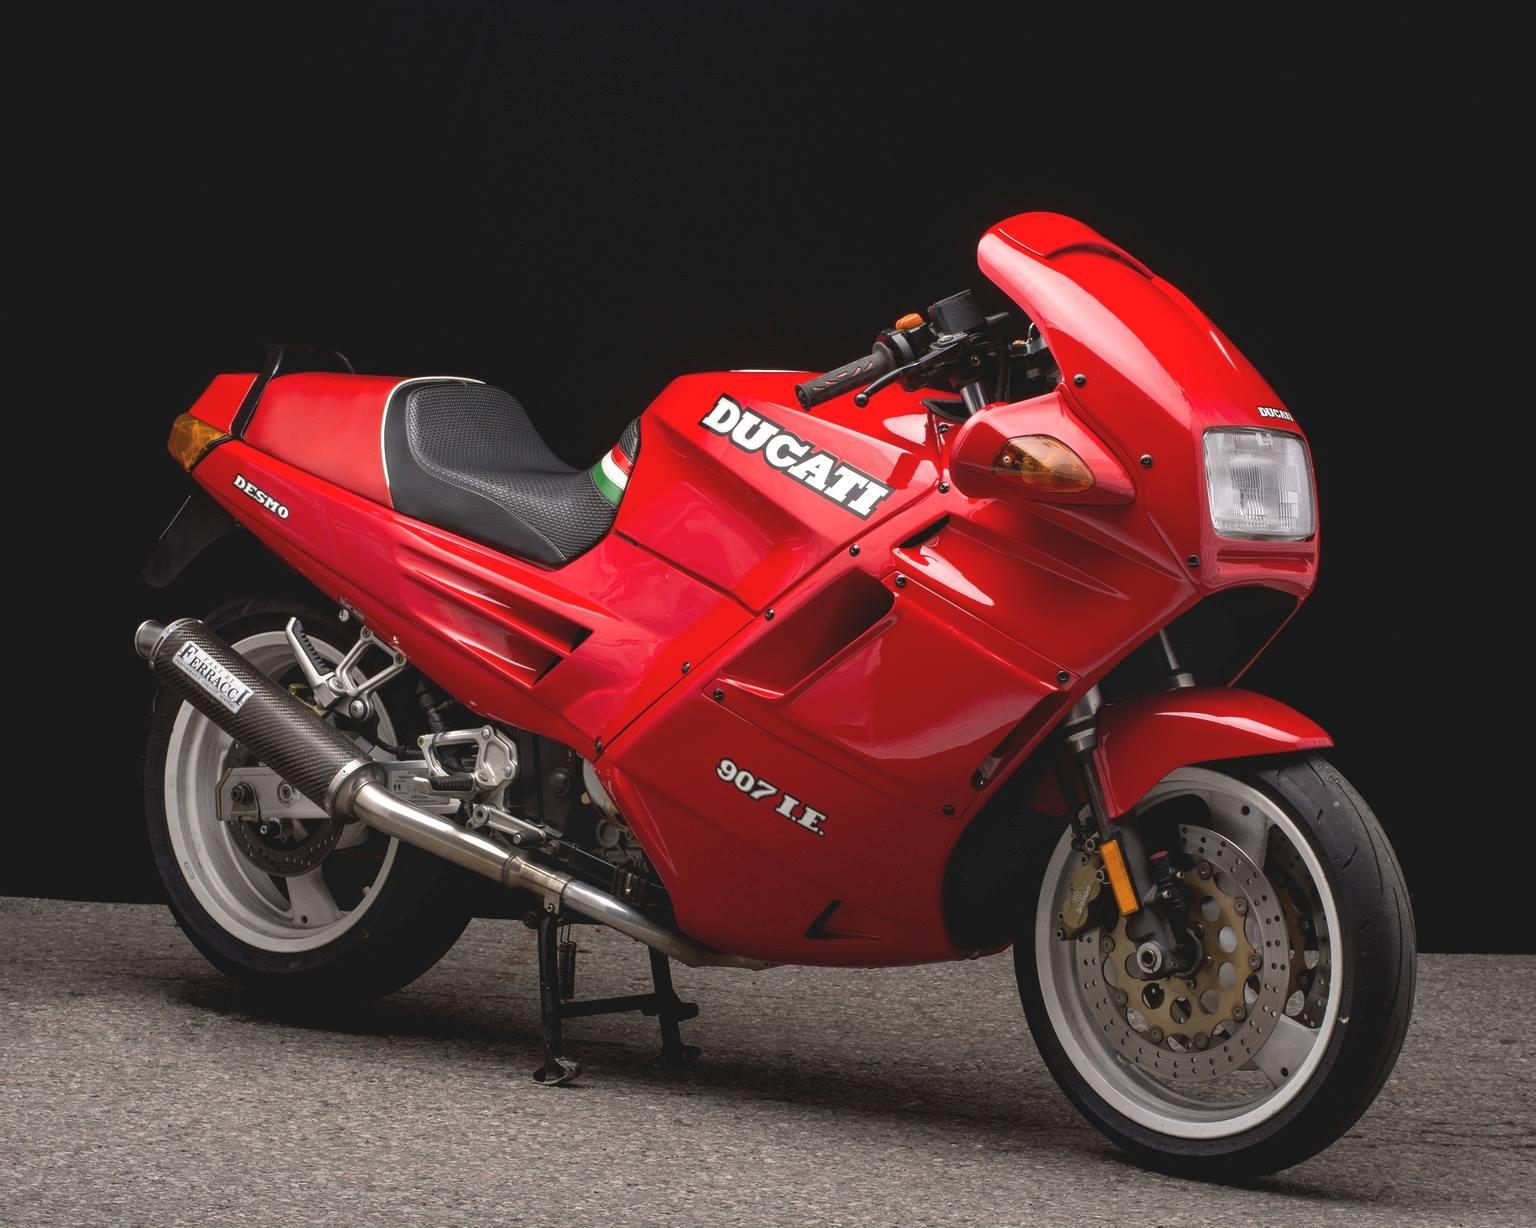 Ducati Paso - acquisition candidate